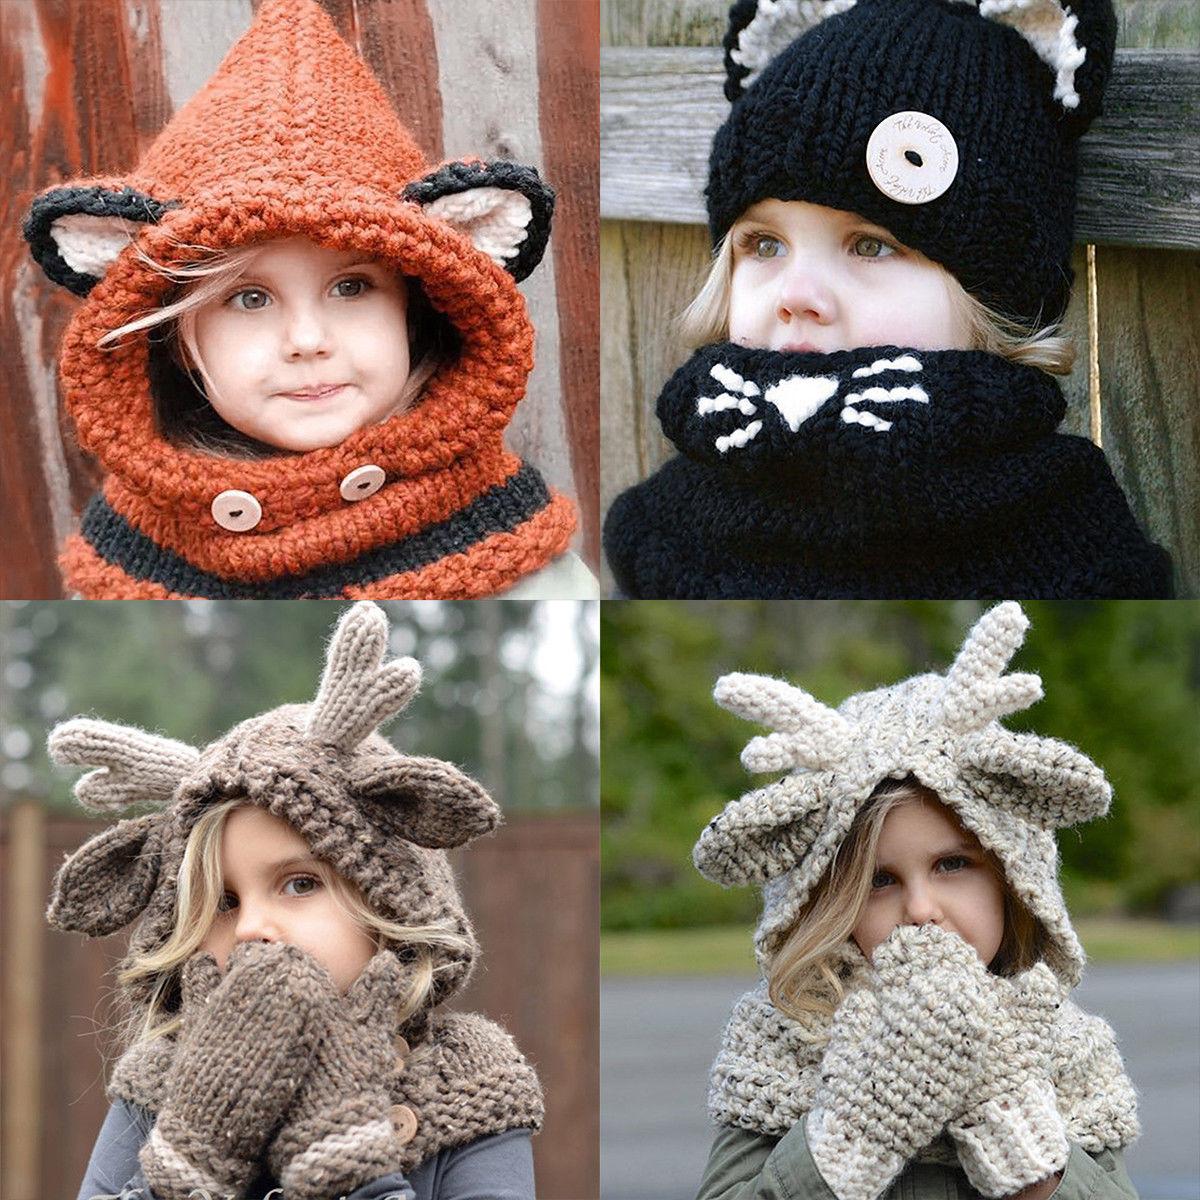 d2c766cd8fd  10.03 - Baby Girl Boy Kids Winter Animals Hooded Scarf Hat Wool Knitted Crochet  Cap Cute  ebay  Fashion